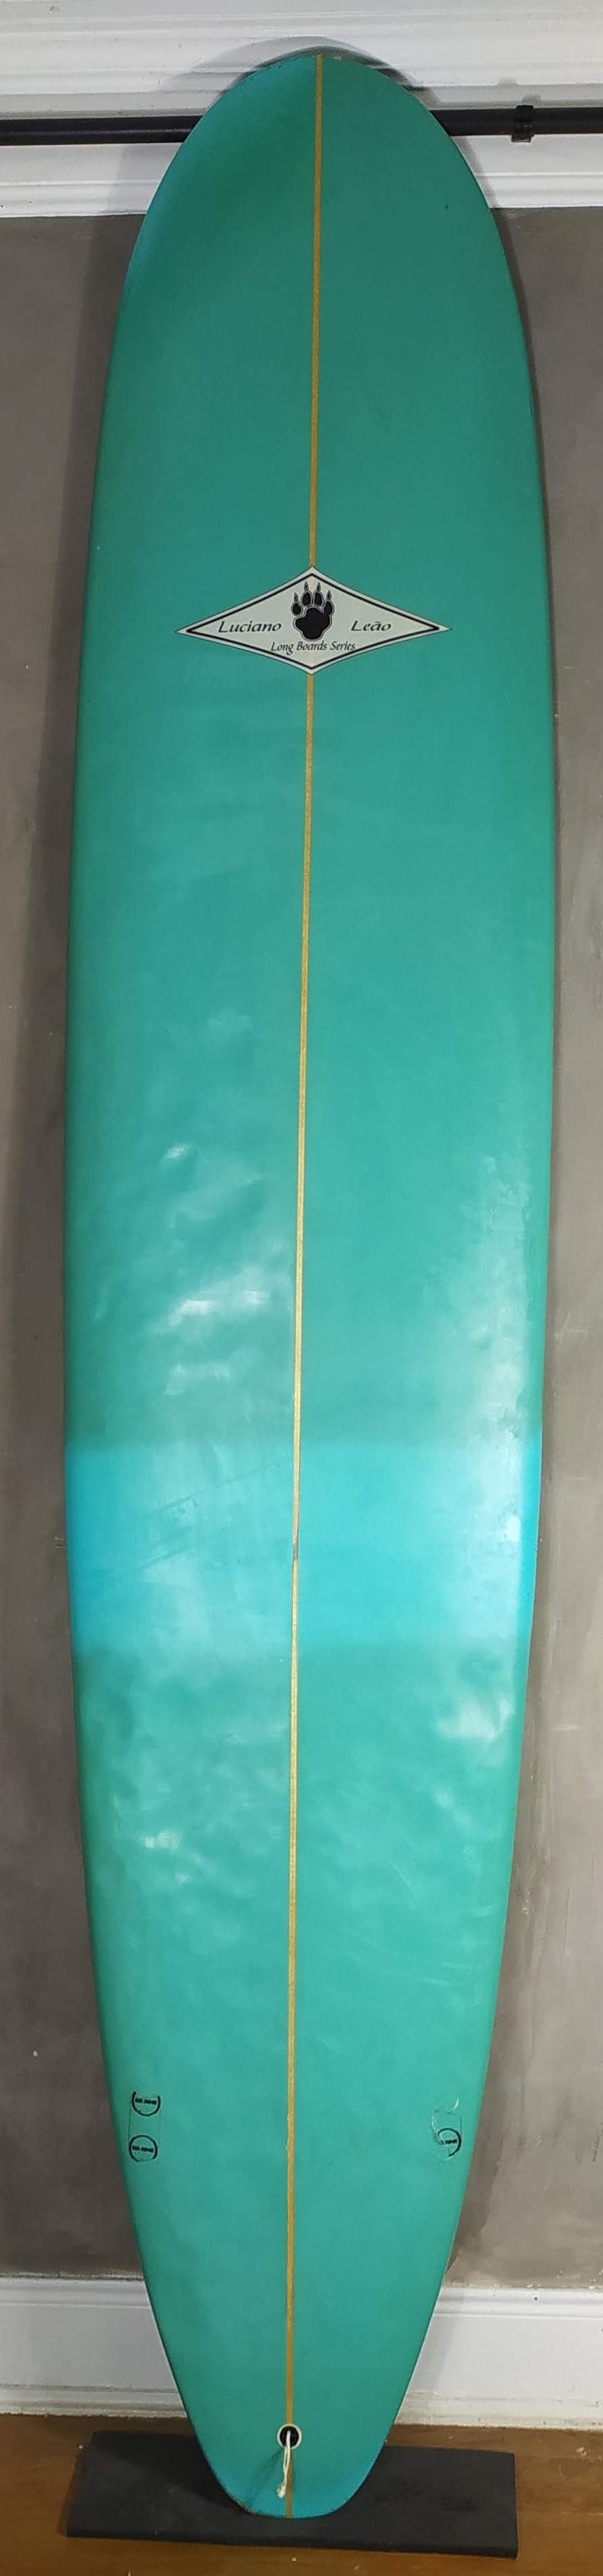 "Longboard Luciano Leão 9'2"" Azul Seminovo"